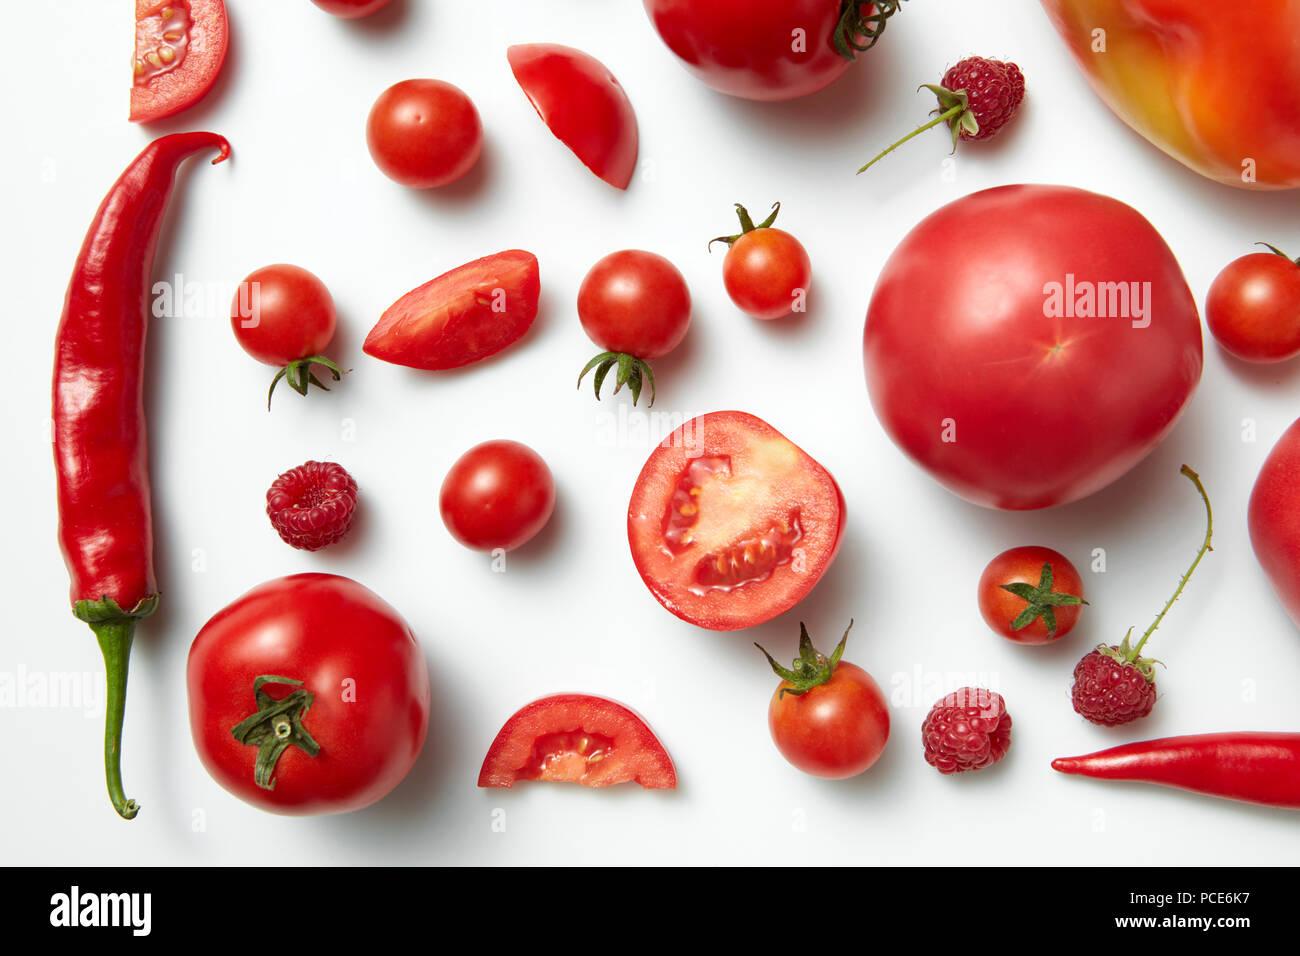 raspberry,chili peppers,cherry tomato - Stock Image